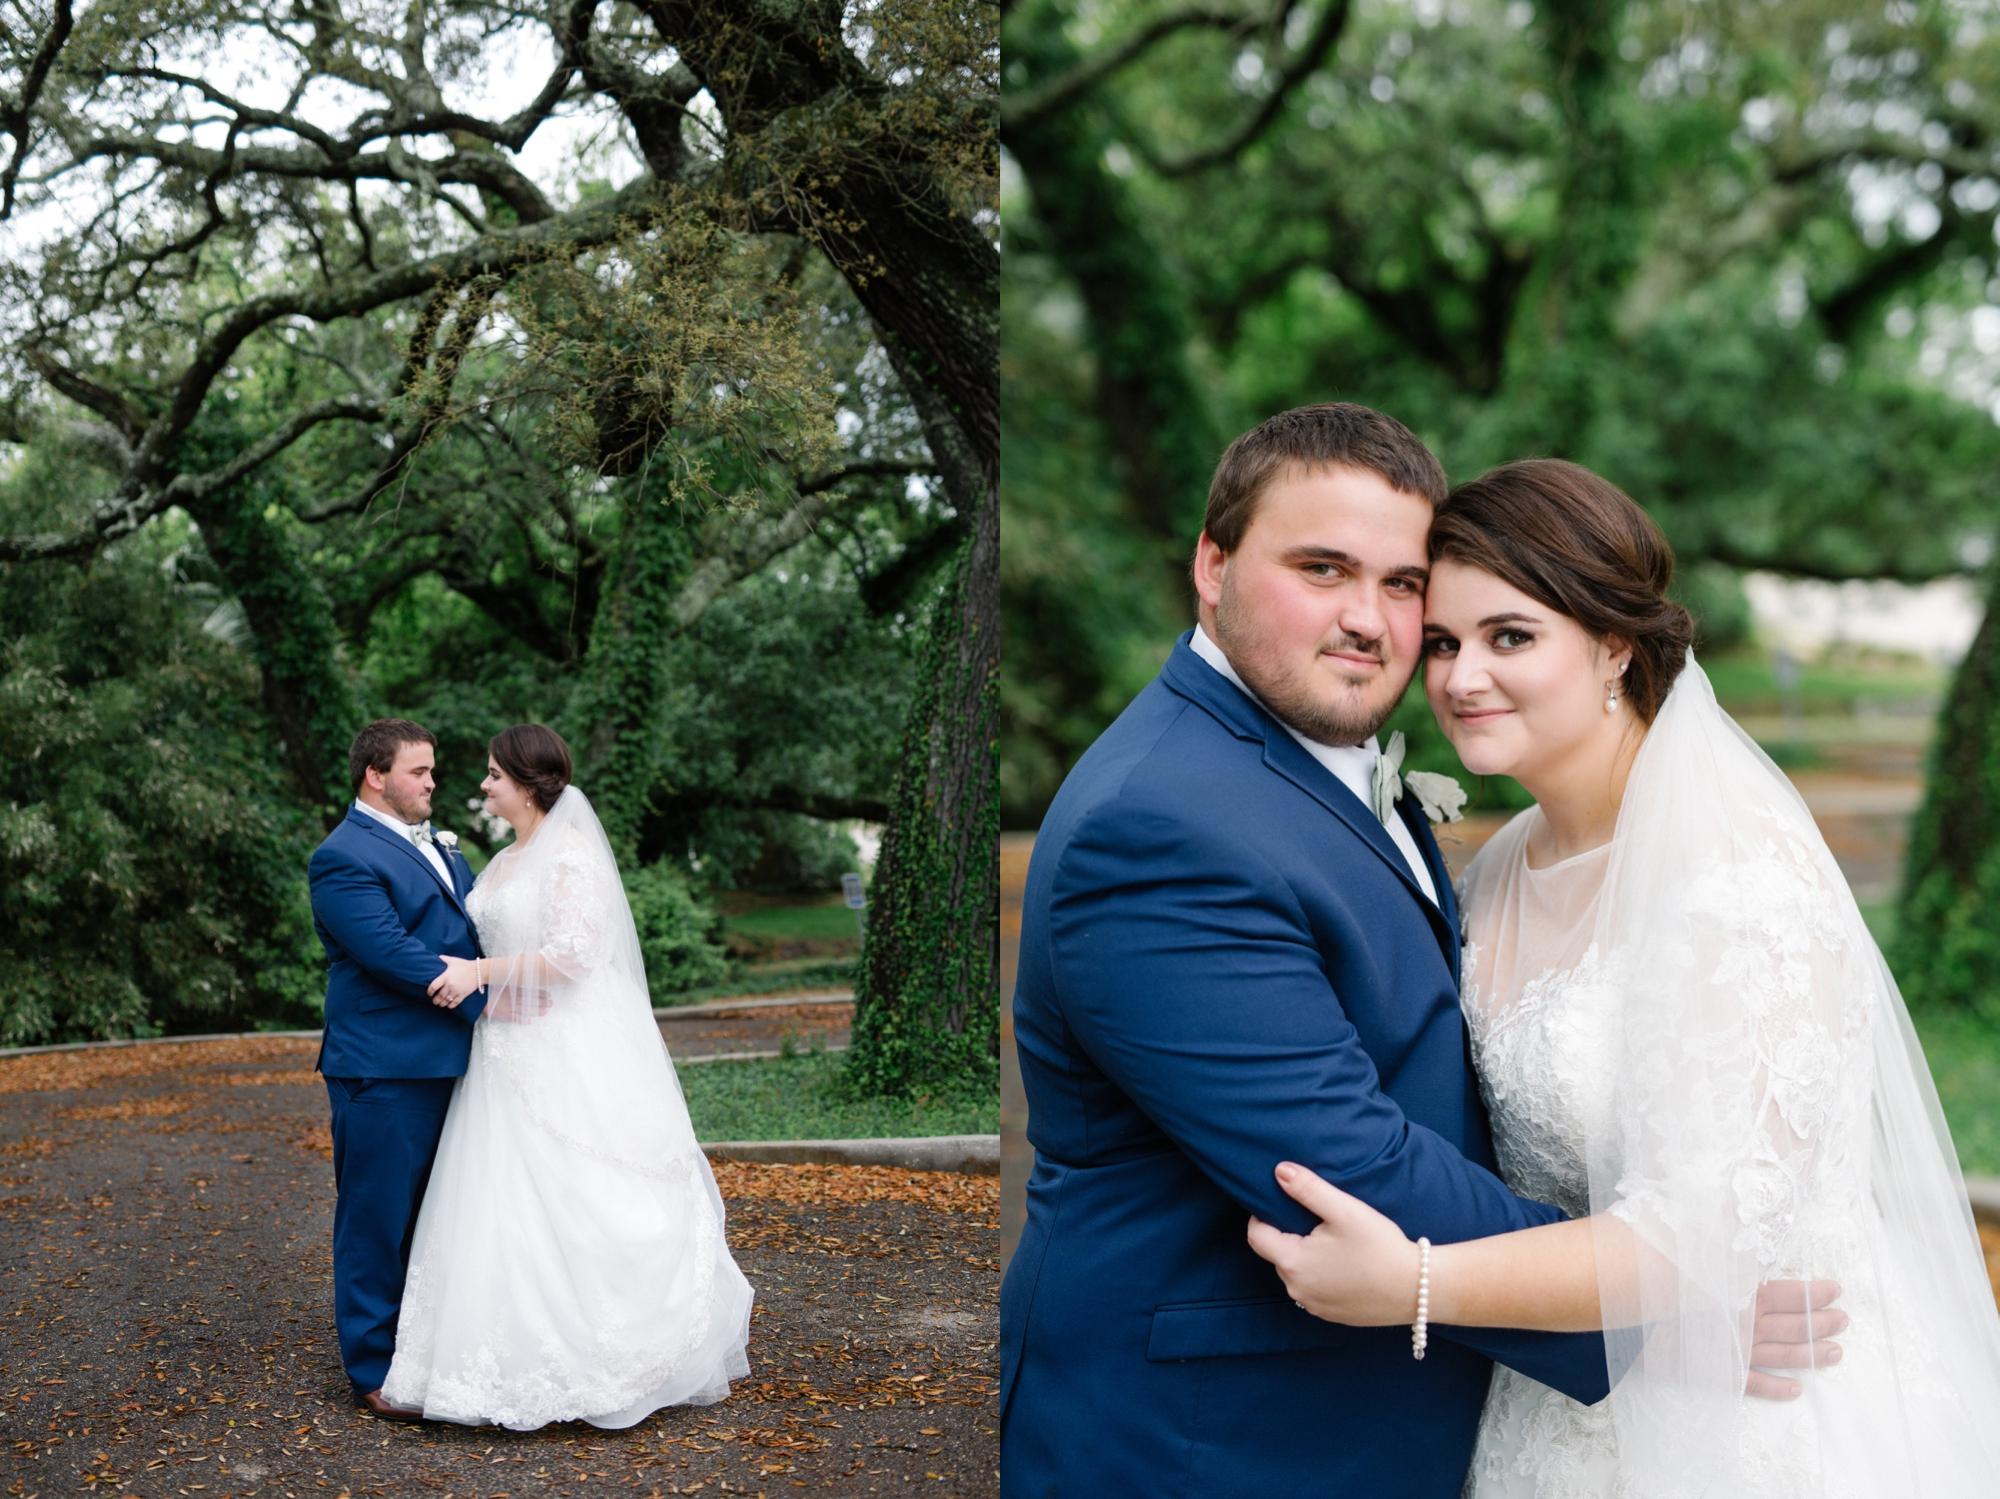 New_Orleans_Wedding_Photographer_0401.jpg